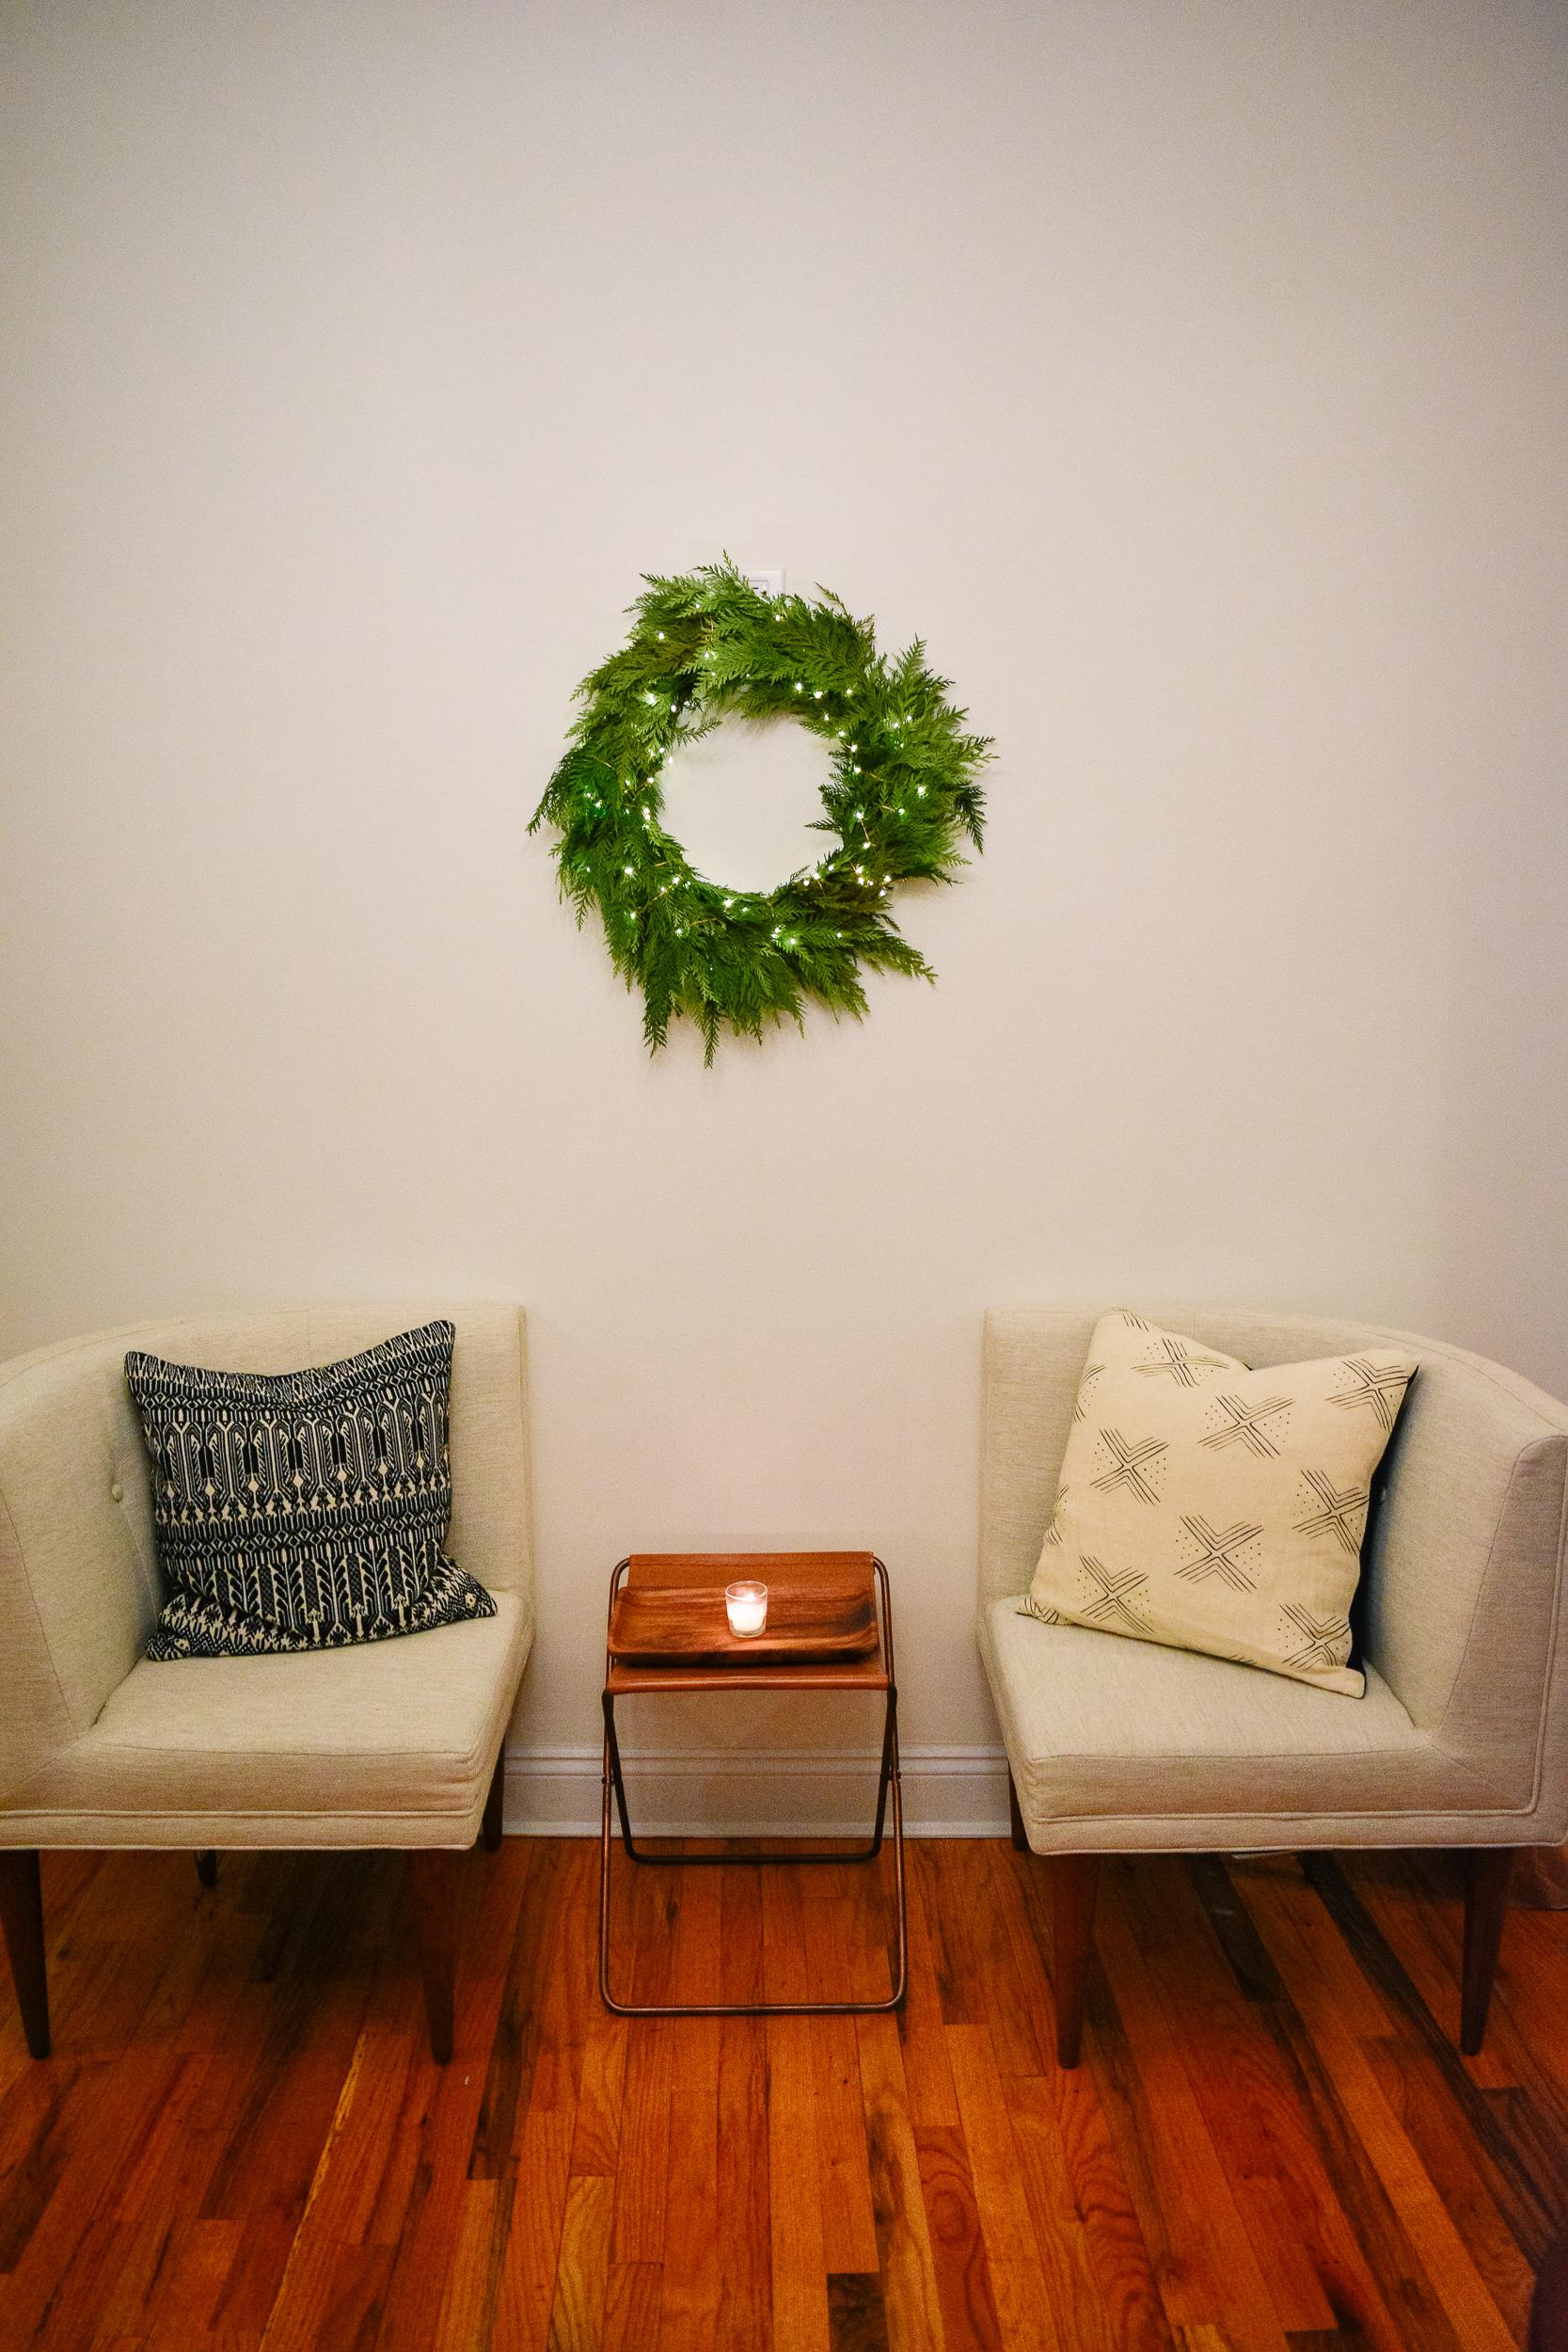 Minimalist Christmas Decorations